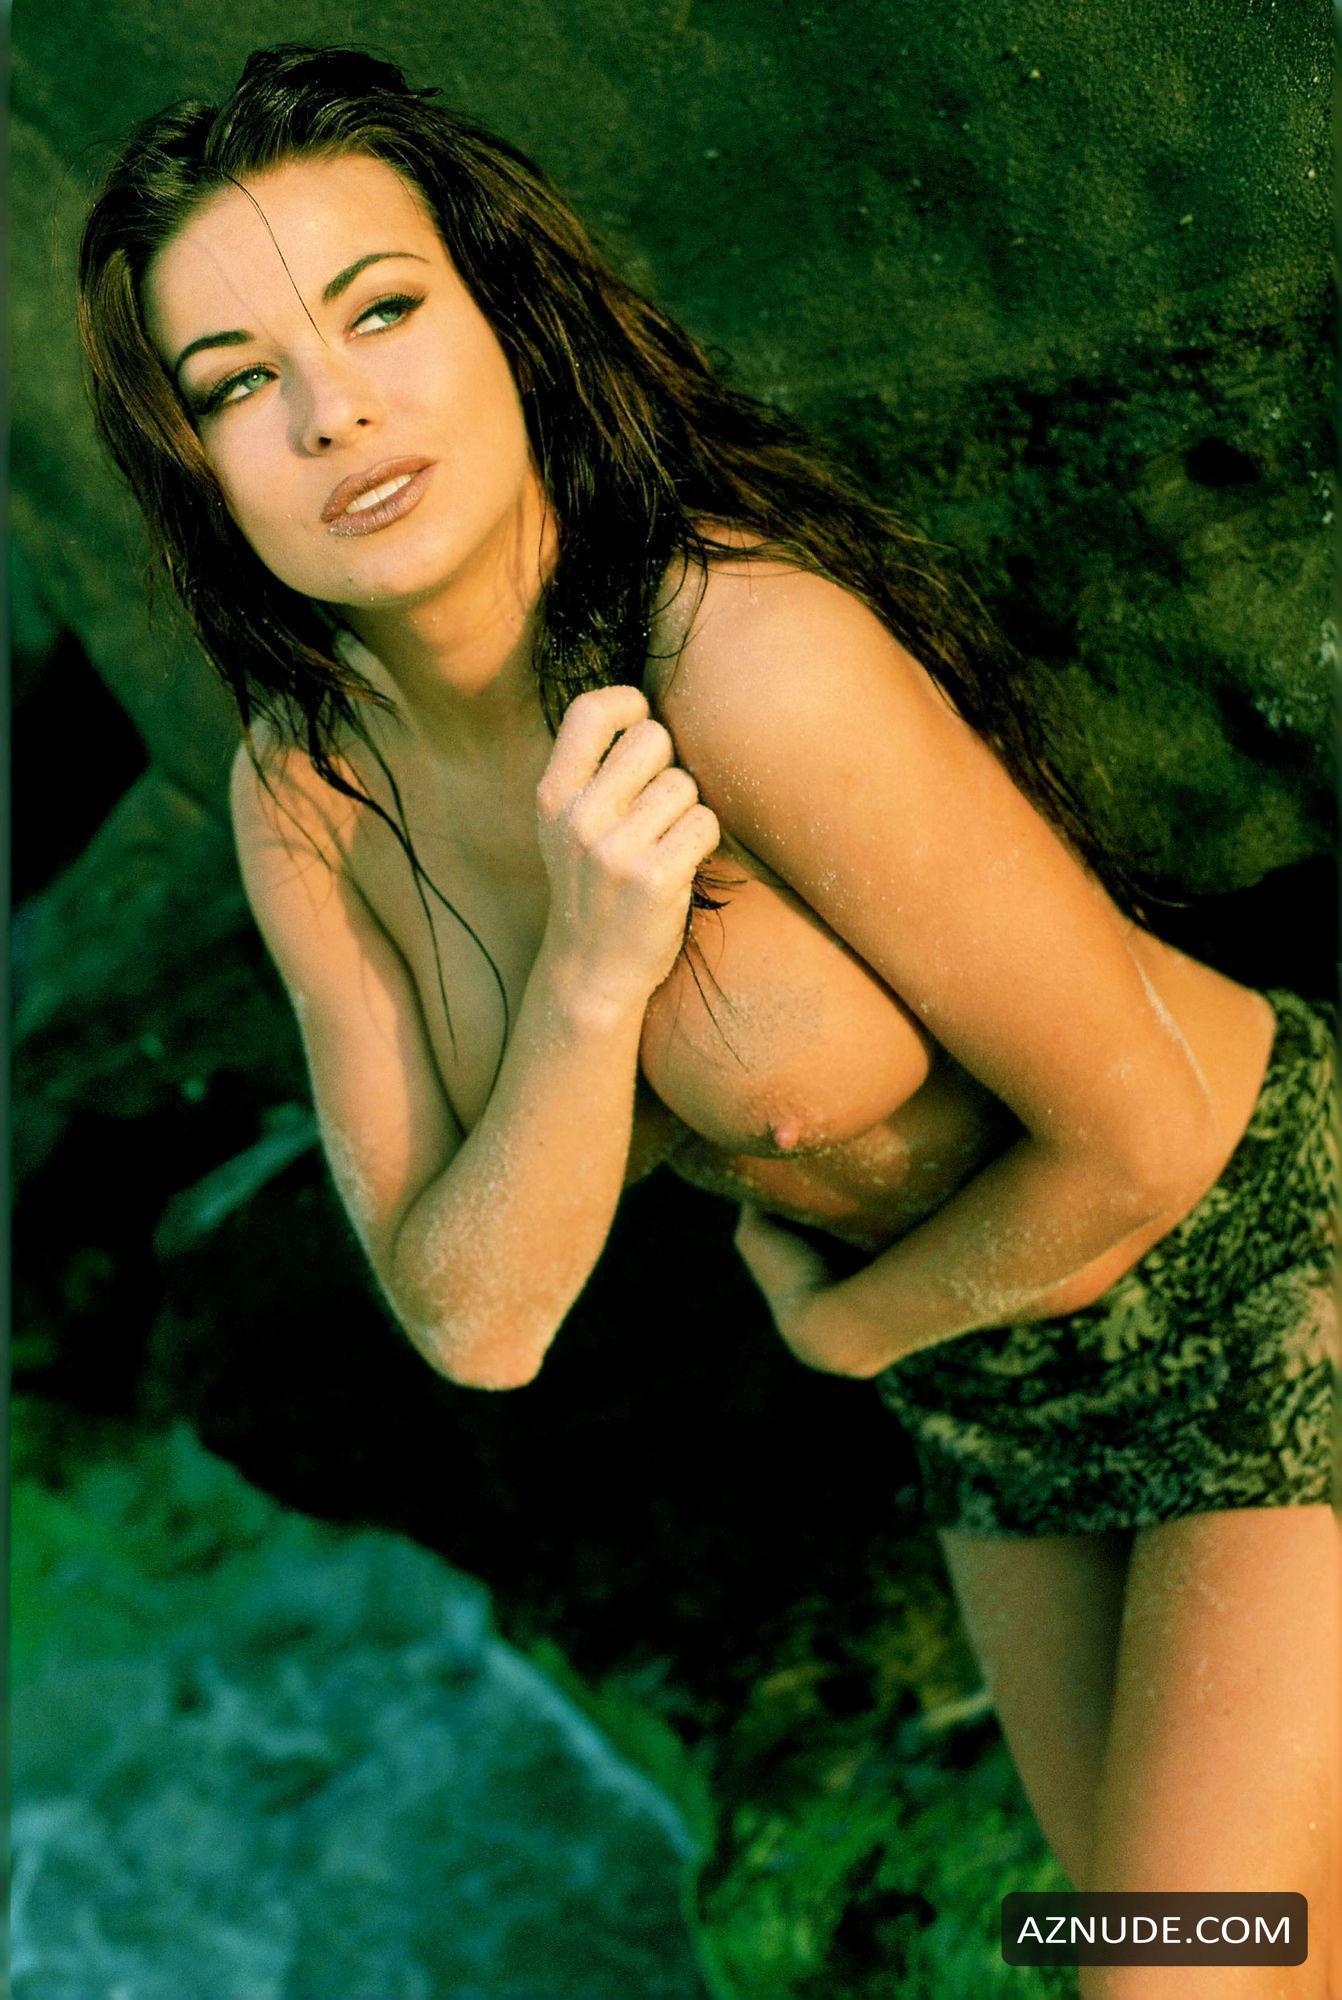 Carmen Electra Nude And Sexy Photo Collection - Aznude-5228